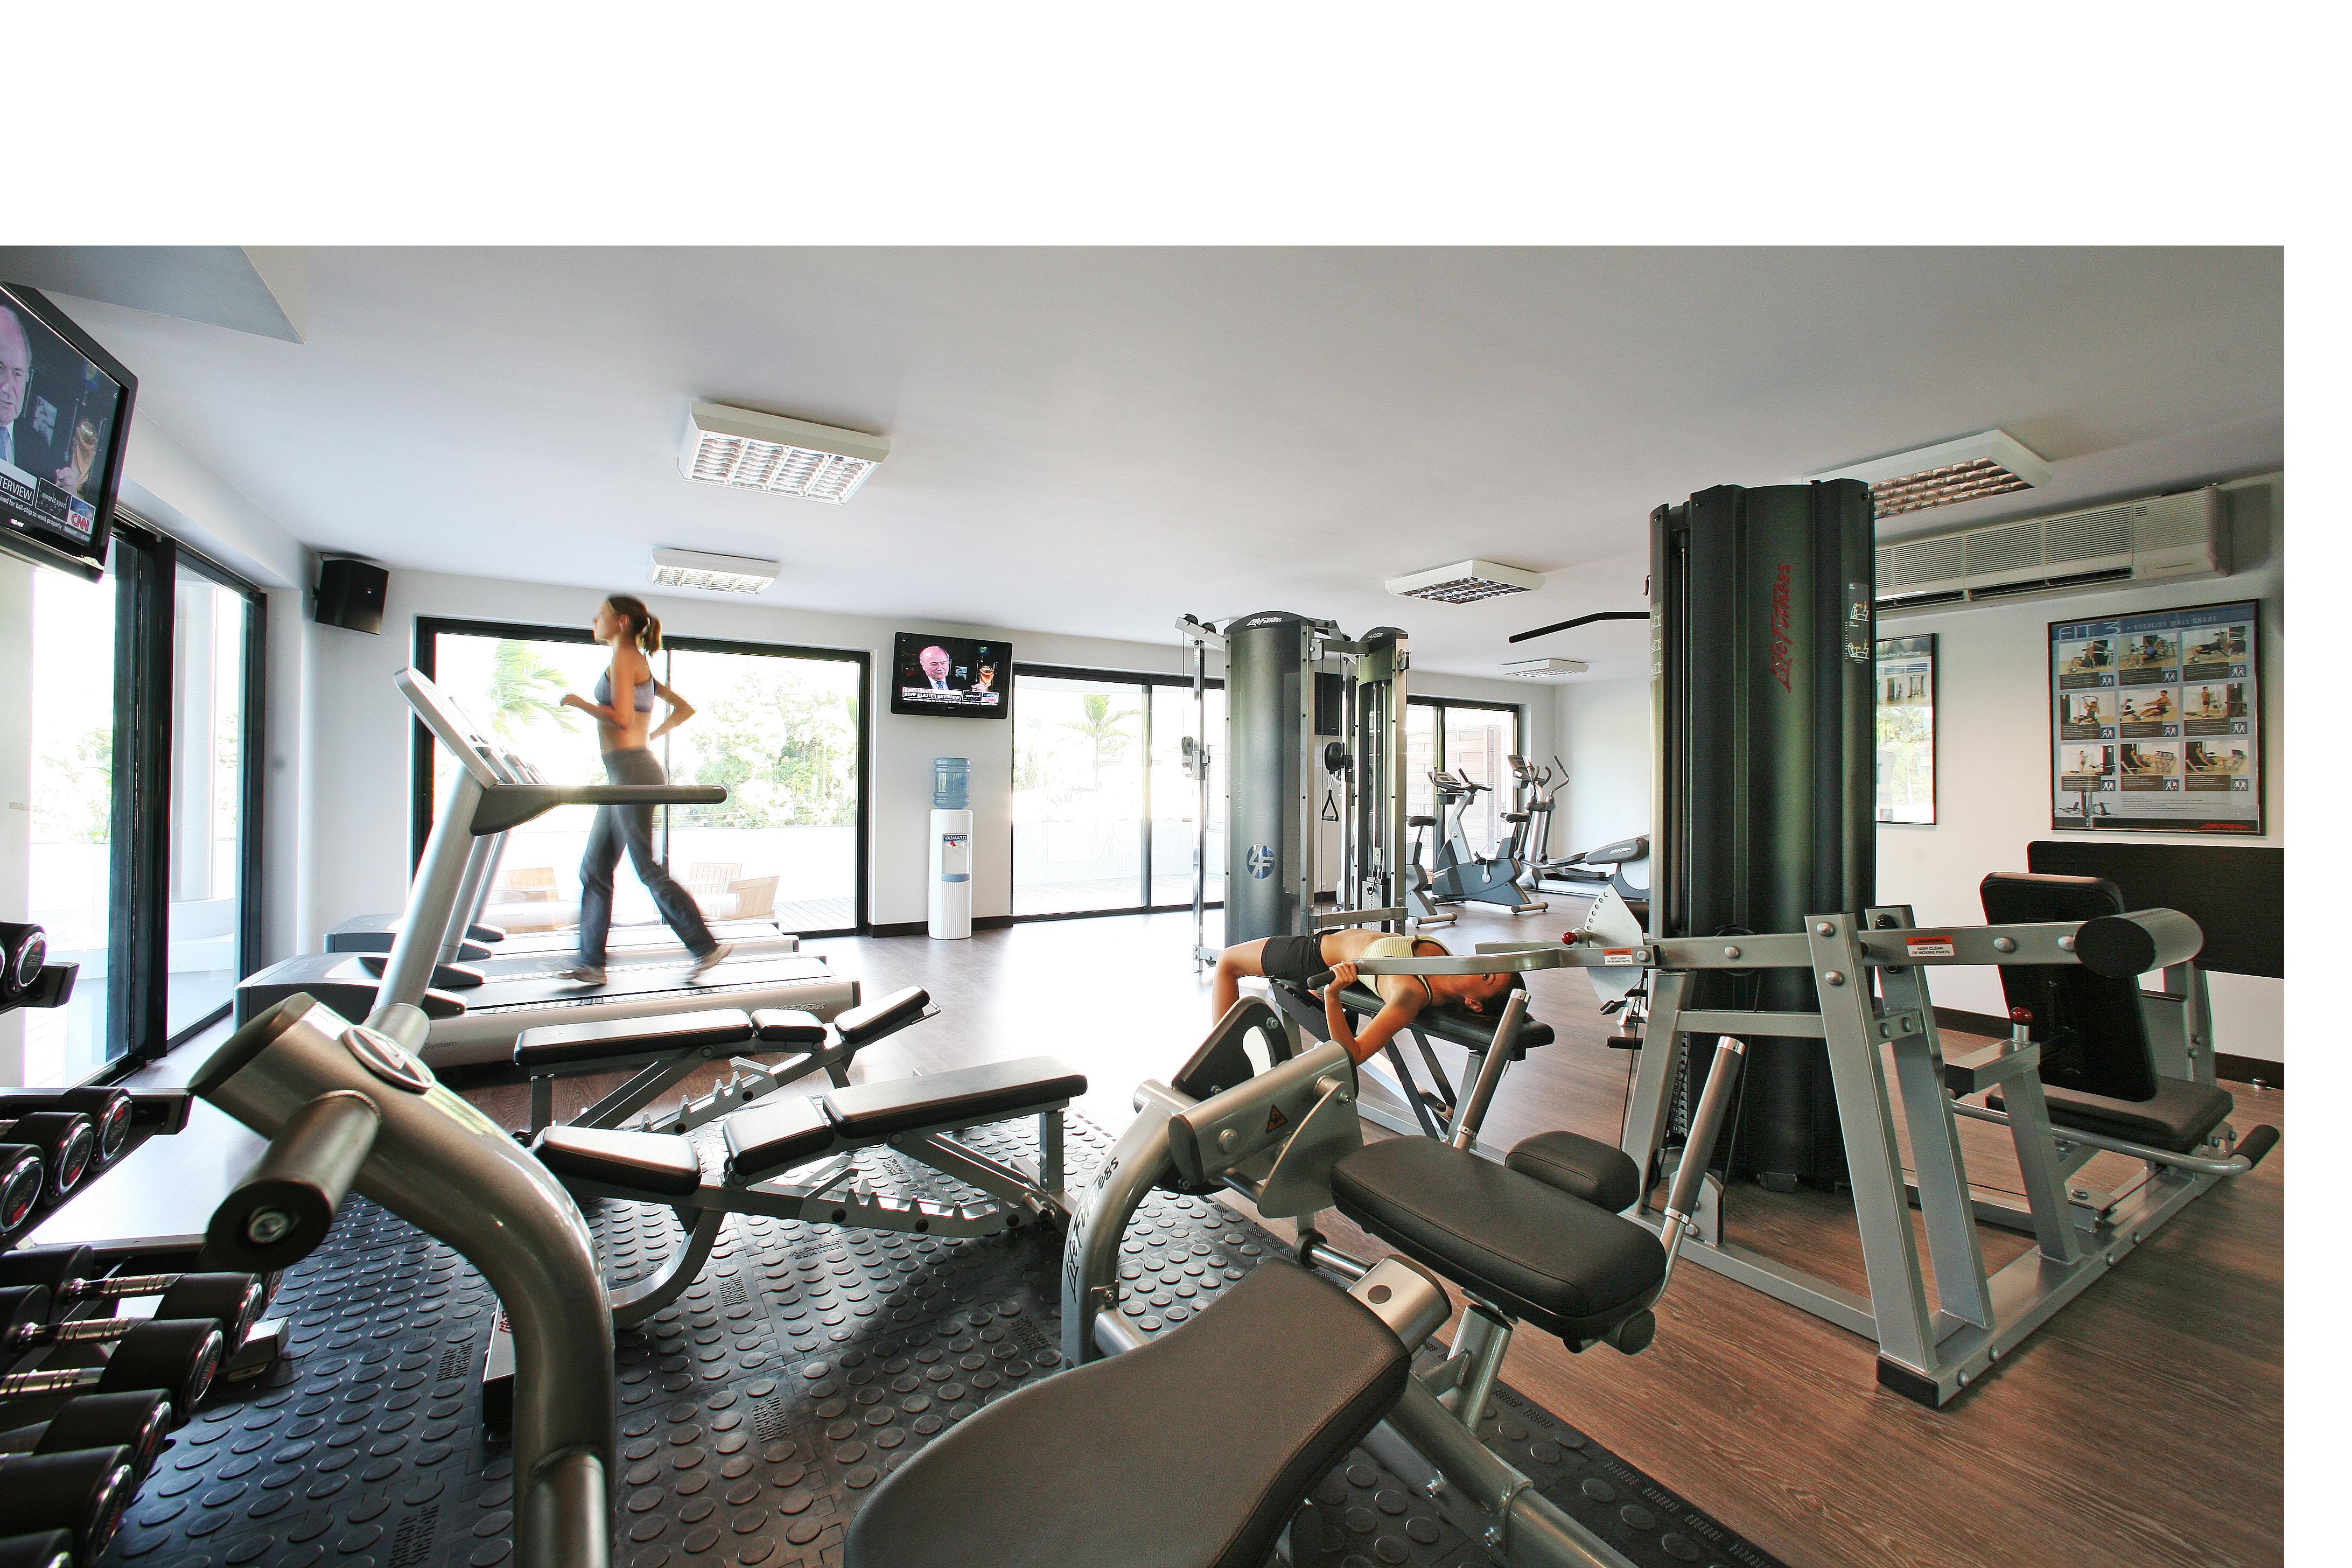 https://tahititourisme.com.br/wp-content/uploads/2017/08/Fitness-centre-2.jpg